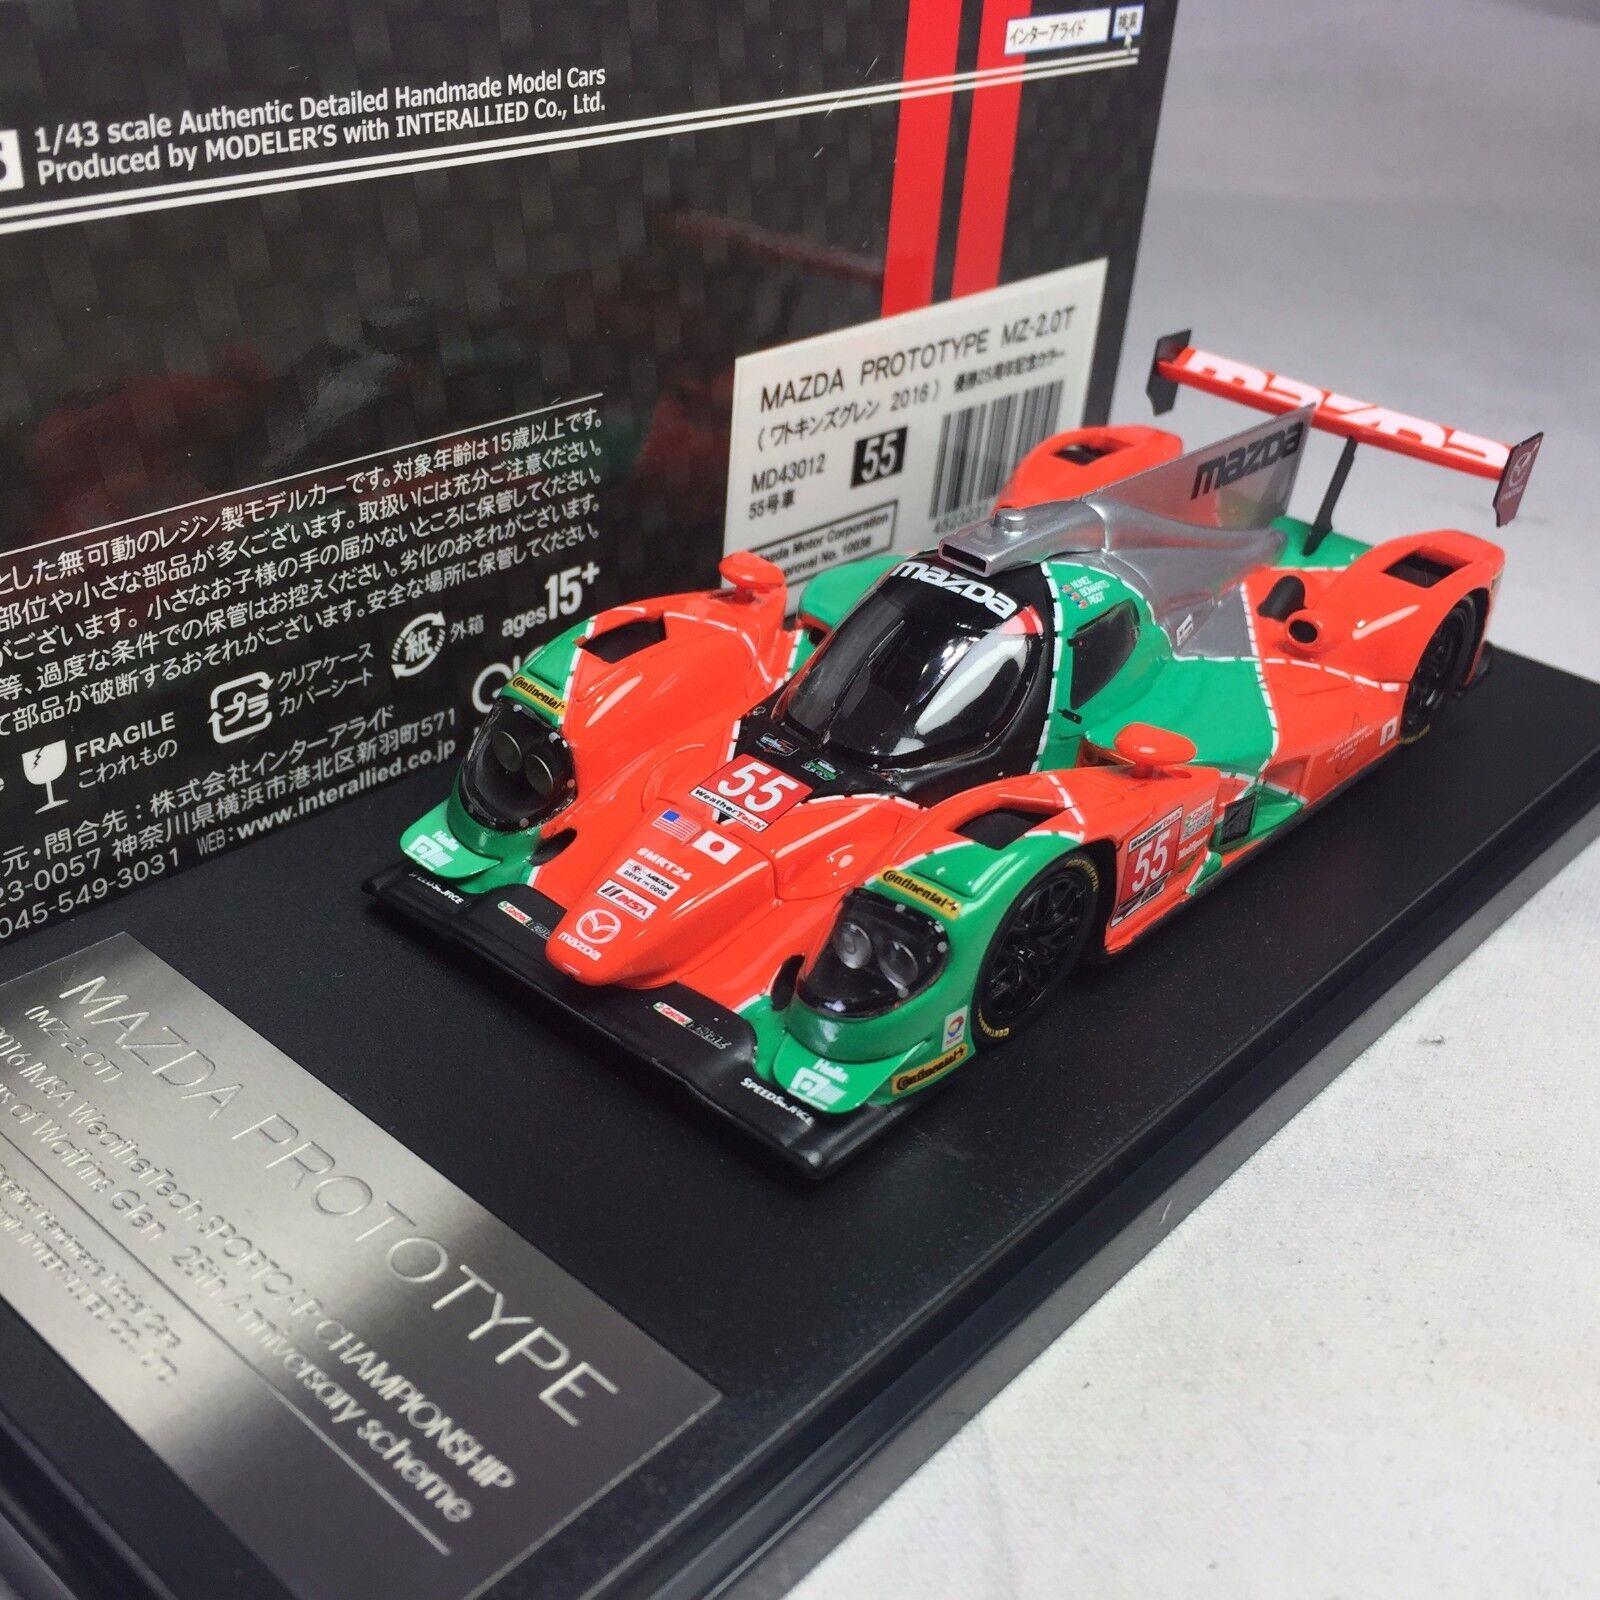 1/43 Hi-Story Modeler's Mazda Prototype MZ-2.0T 2016 IMSA Championship  55